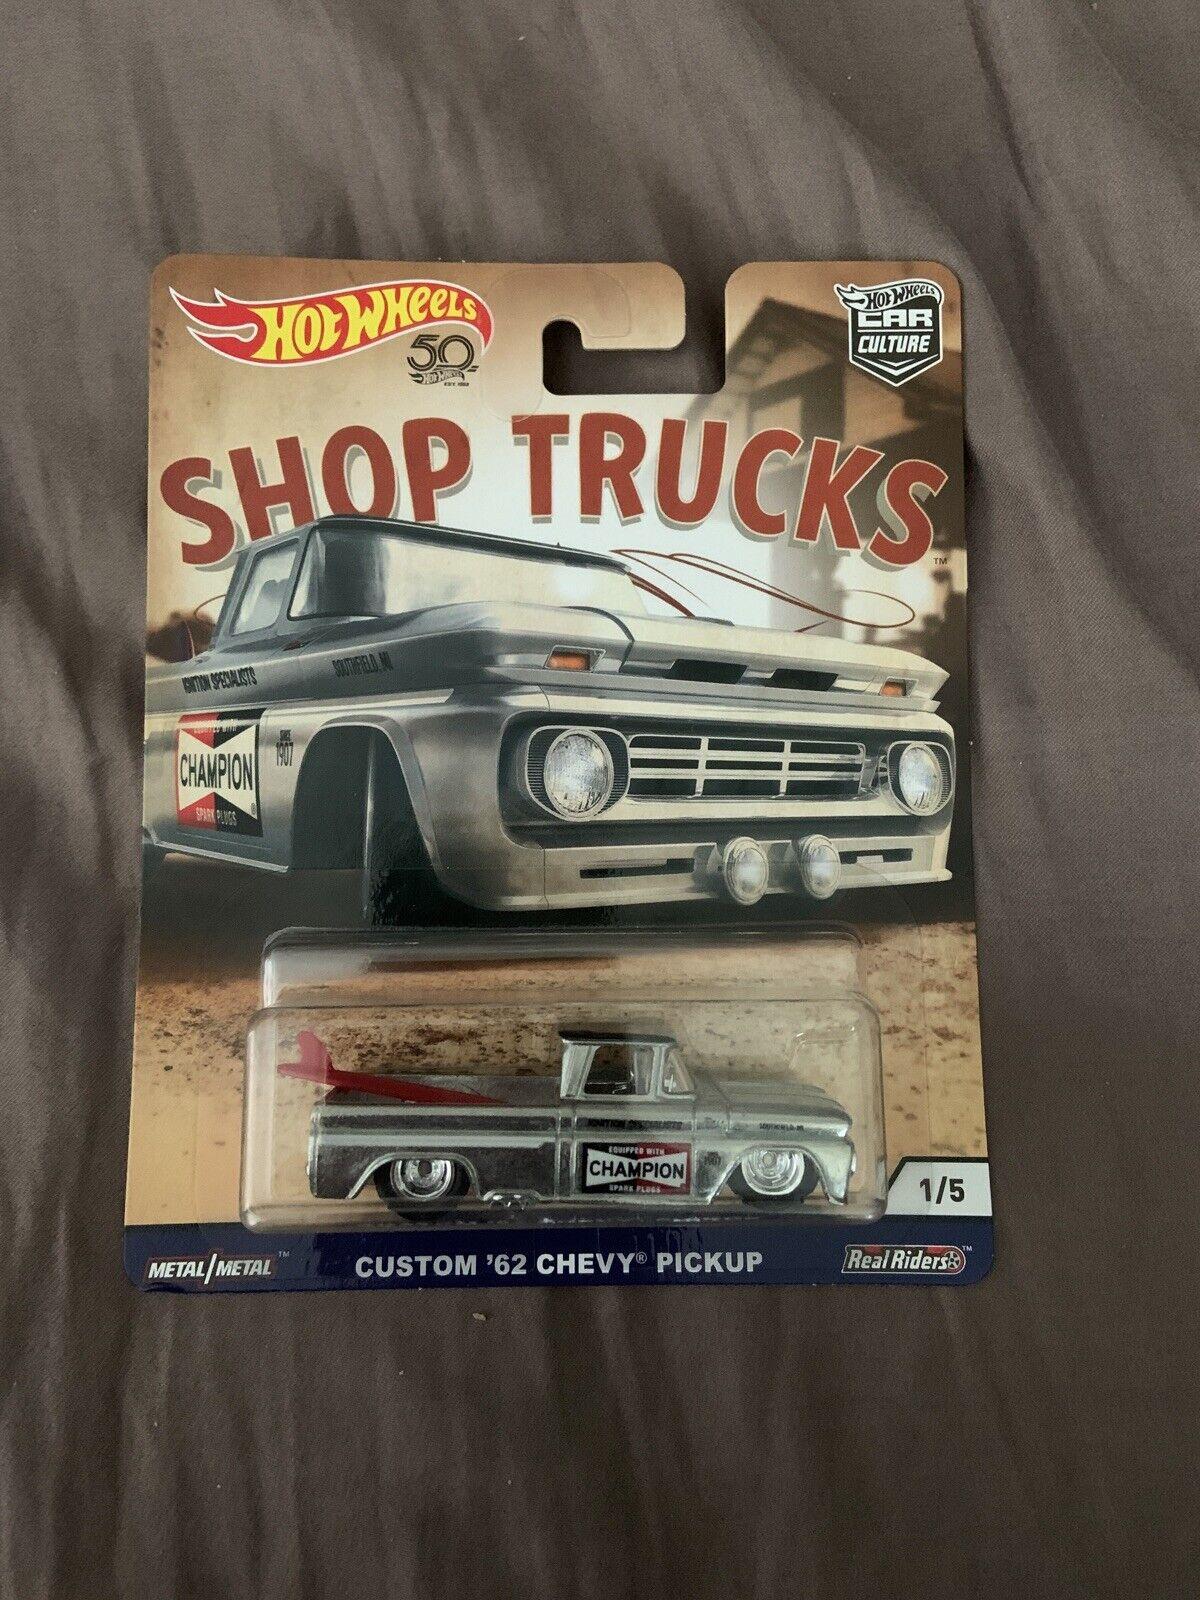 /'83 Chevy Silverado Pickup Shop Trucks Car Culture 1:64 Hot Wheels FLC22 FPY86